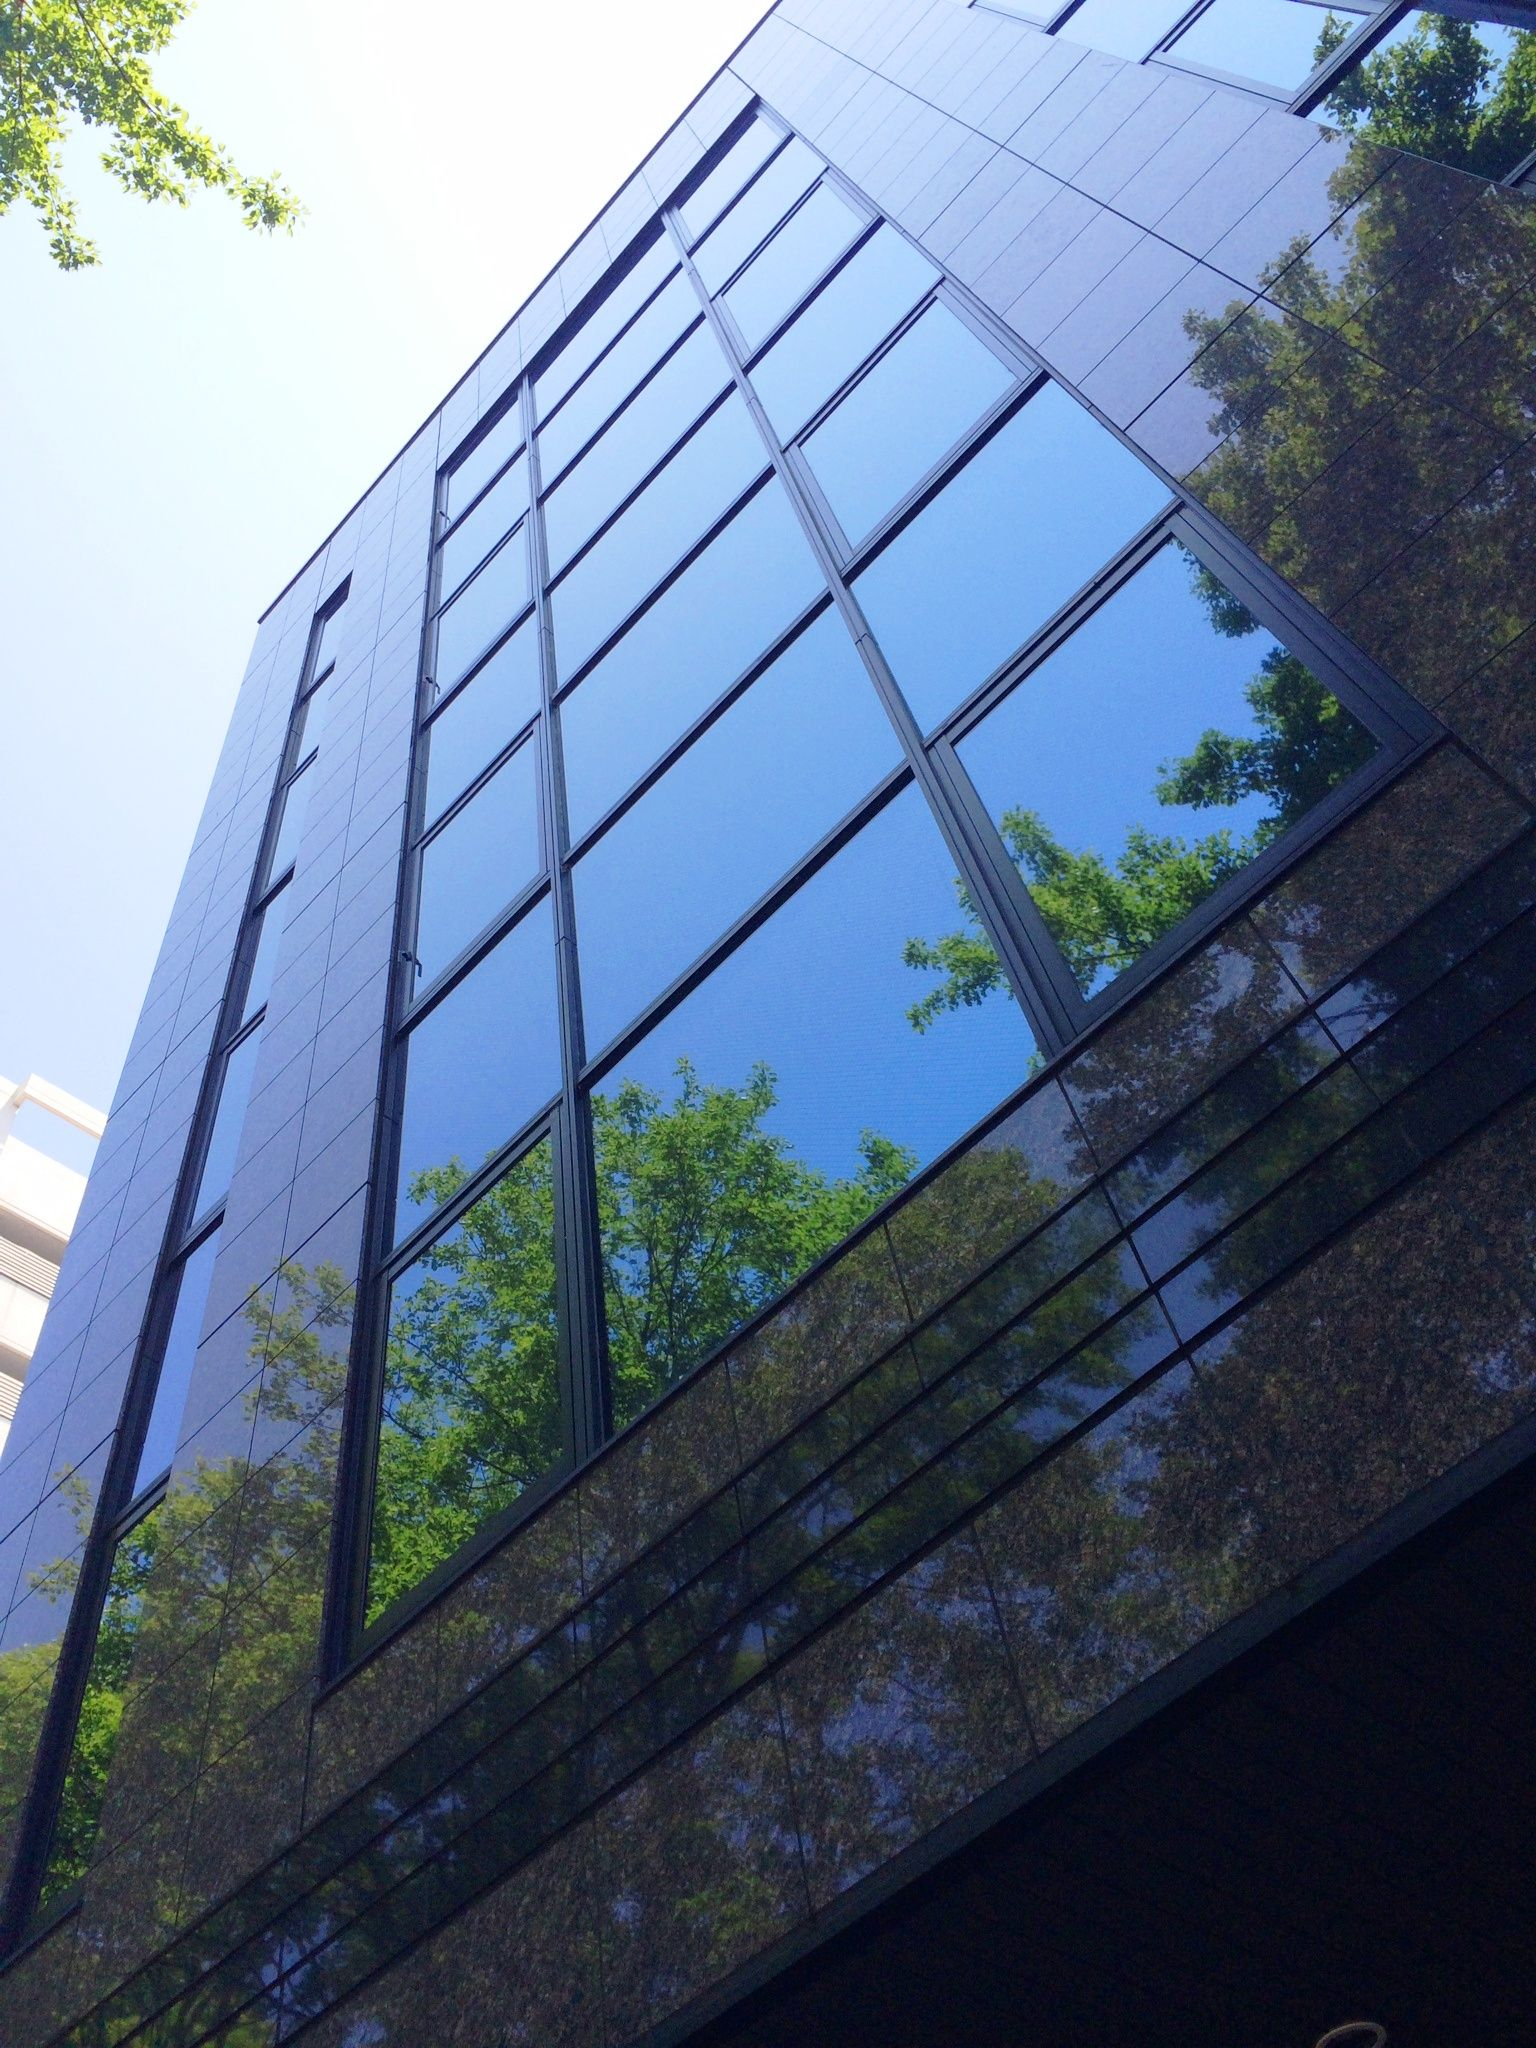 Forest Building by Manabu Moriwaki